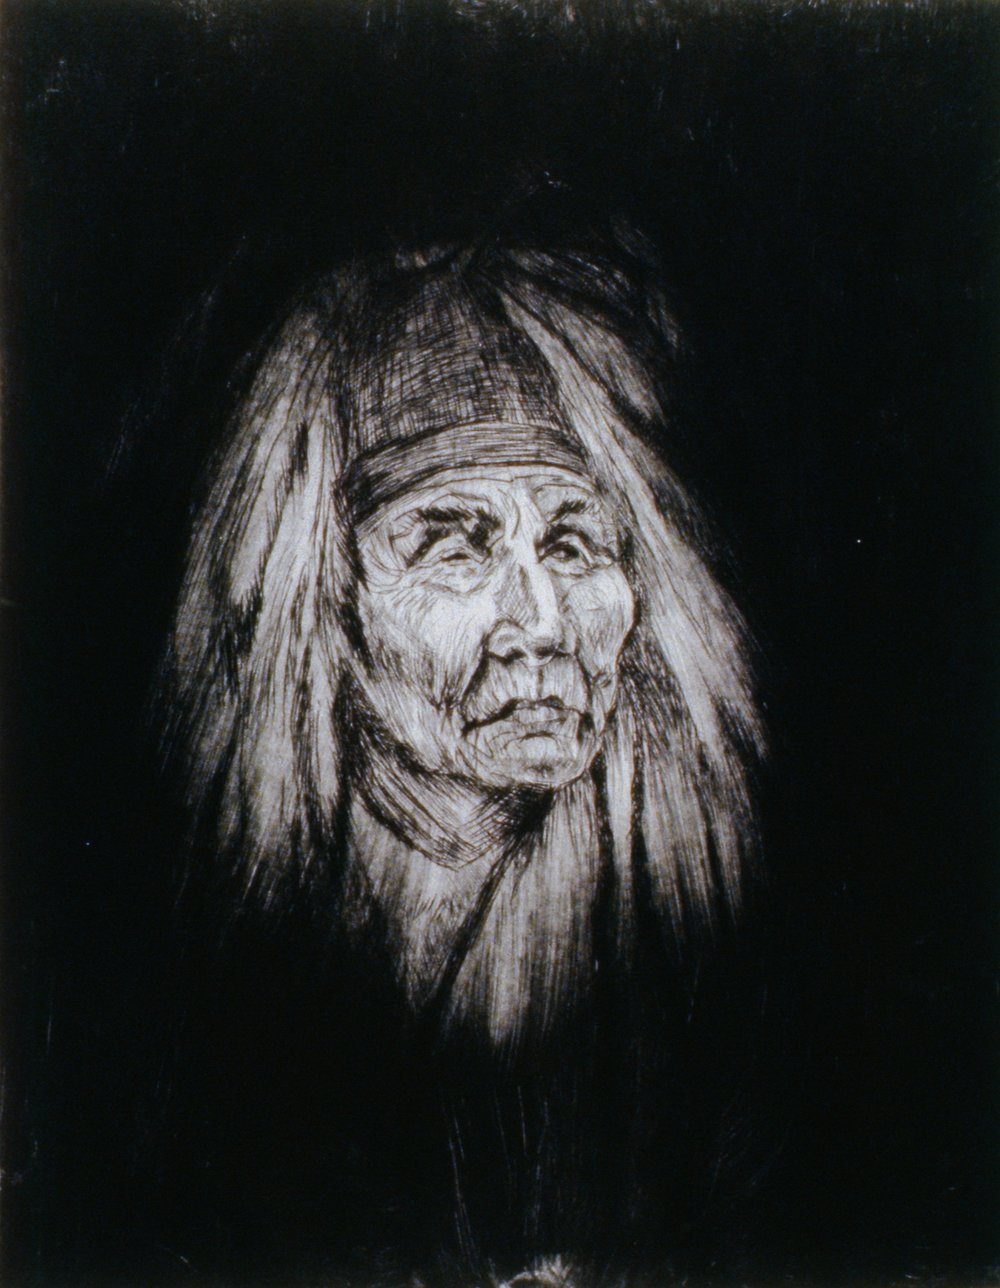 Shaman, 1980, Minn Sjløseth, artist proof, 25 x 20 cm, 1996.02.09